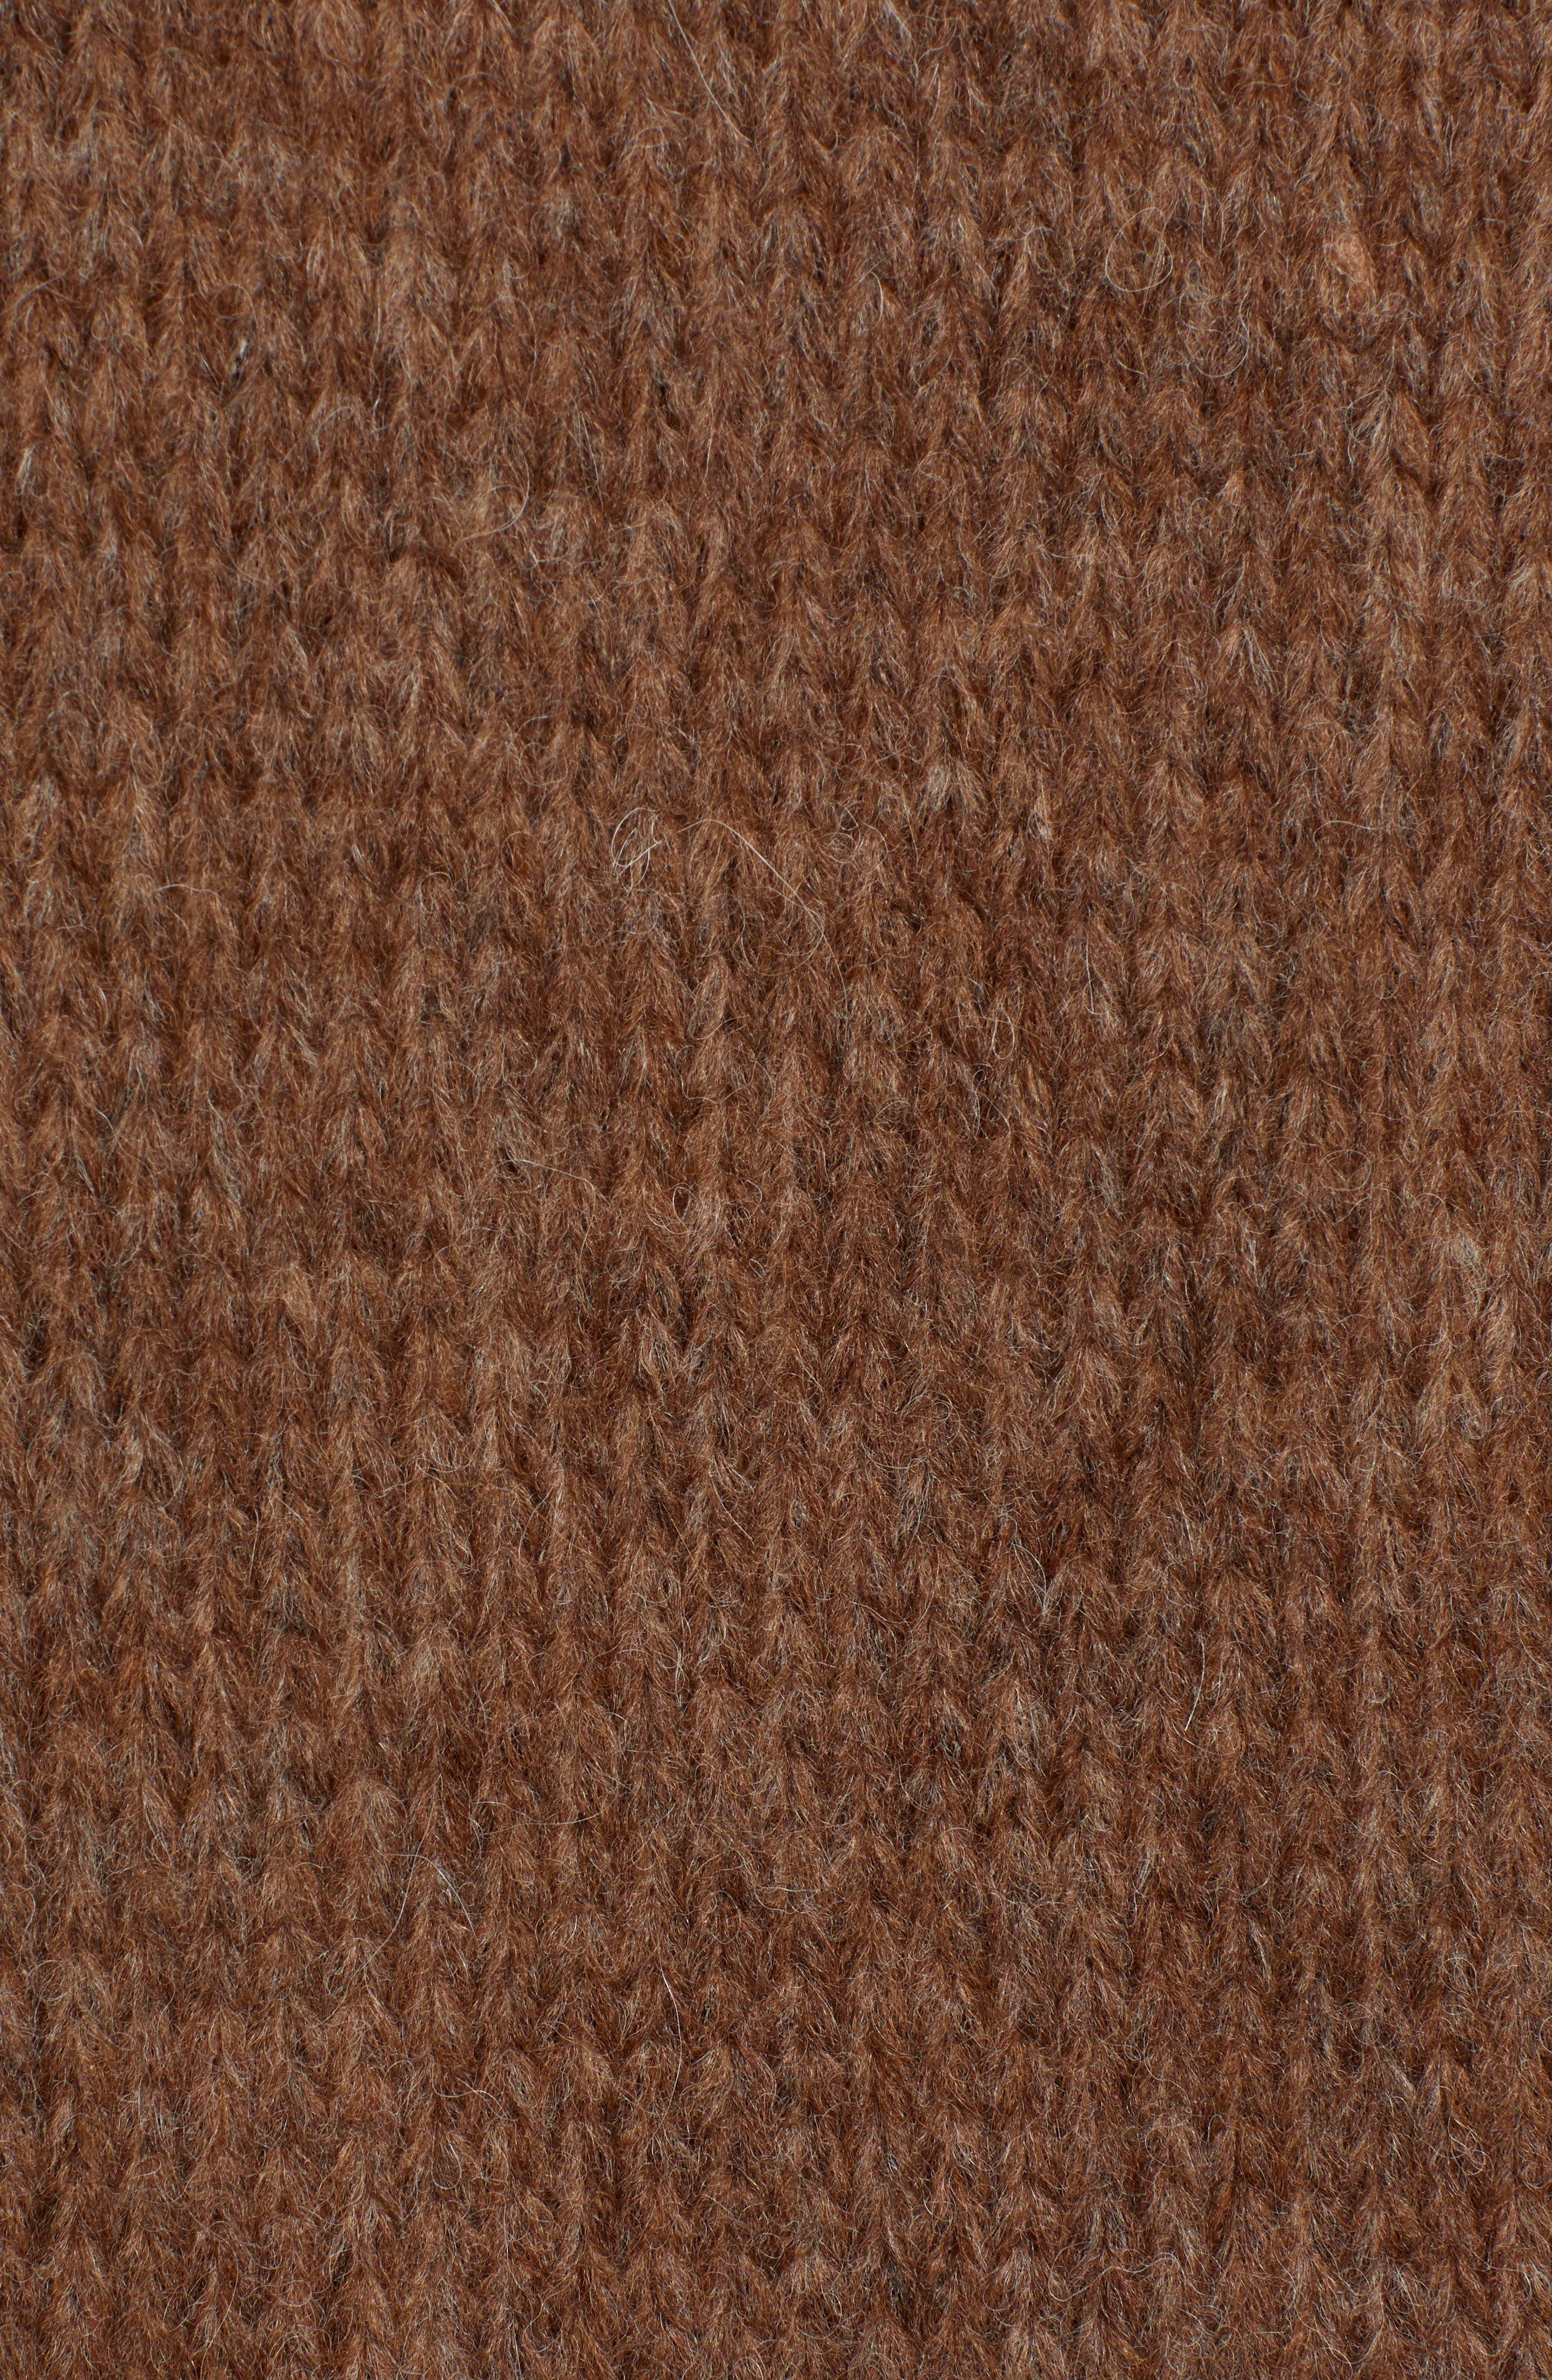 Alpaca Wool Blend Cardigan,                             Alternate thumbnail 5, color,                             CHOCOLATE